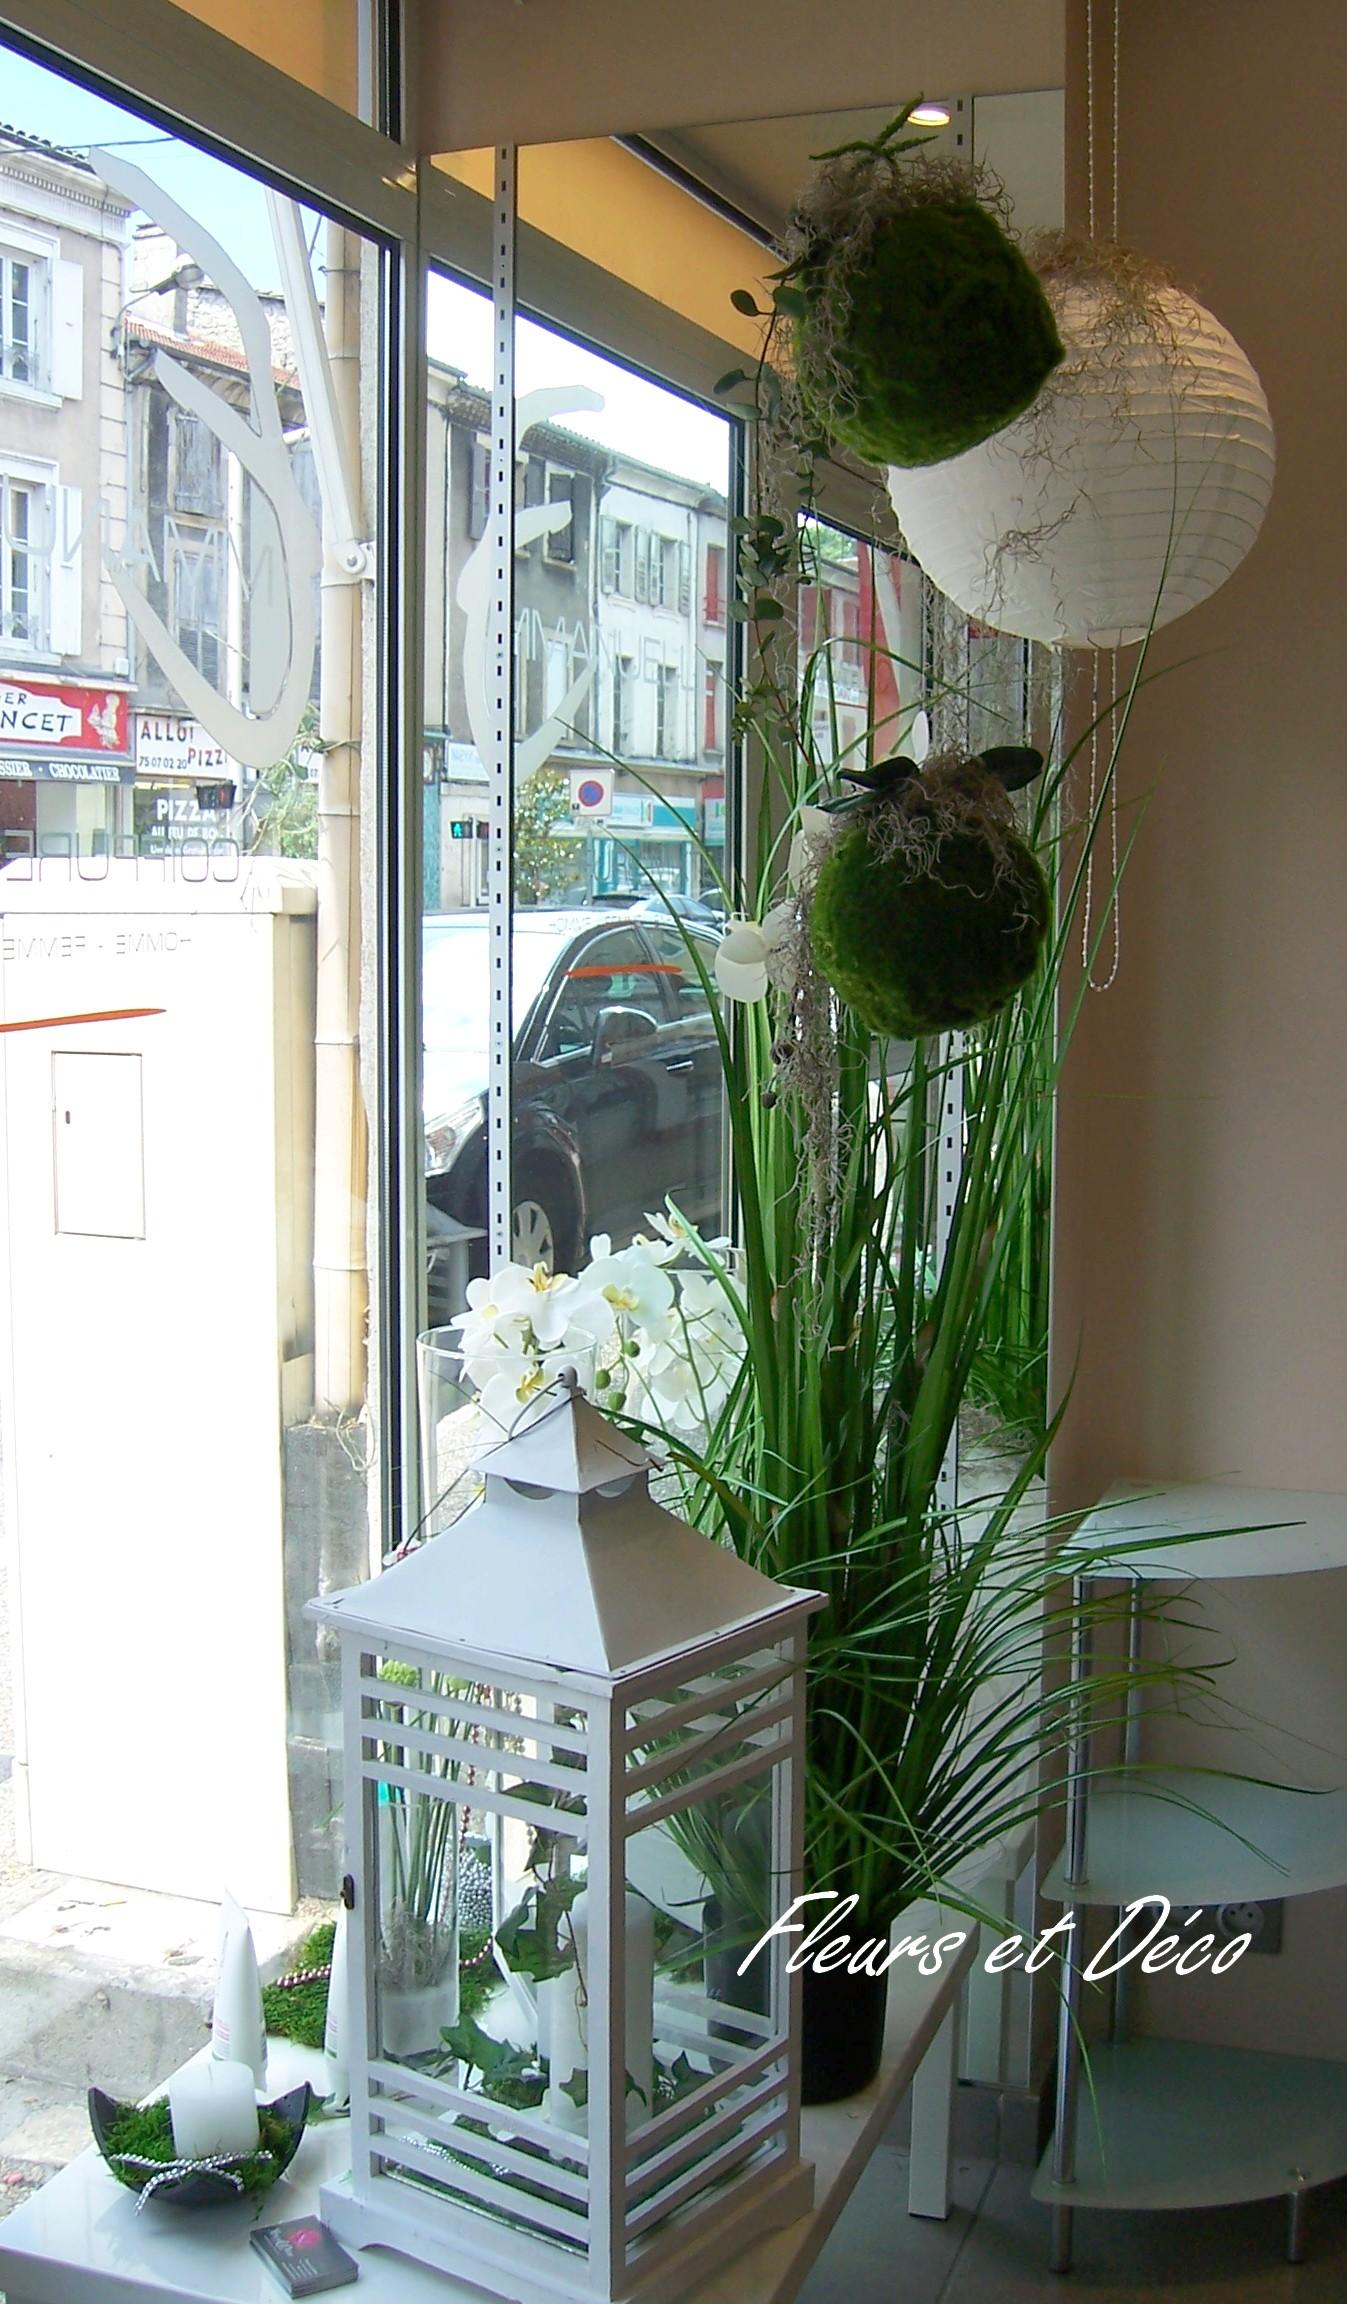 ambiance zen en blanc vert fleurs et d co. Black Bedroom Furniture Sets. Home Design Ideas